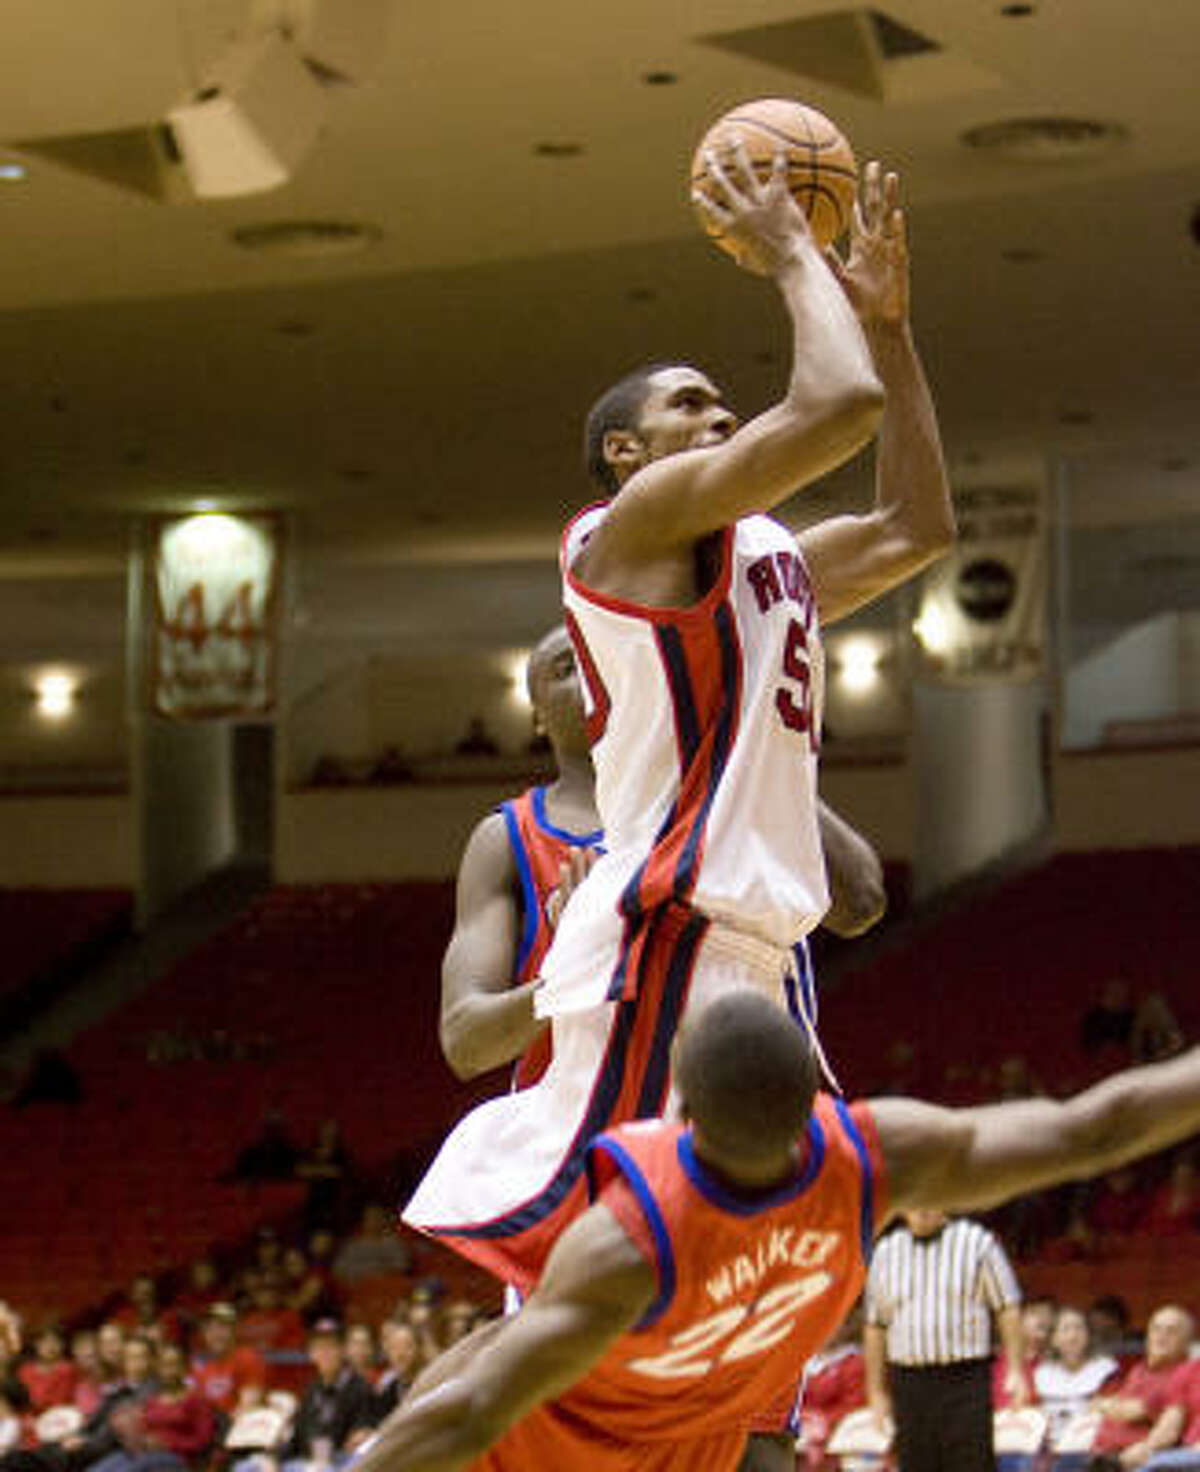 Houston center Marcus Cousin (shown last season) had 14 points and 10 rebounds against Texas A&M-Corpus Christi.